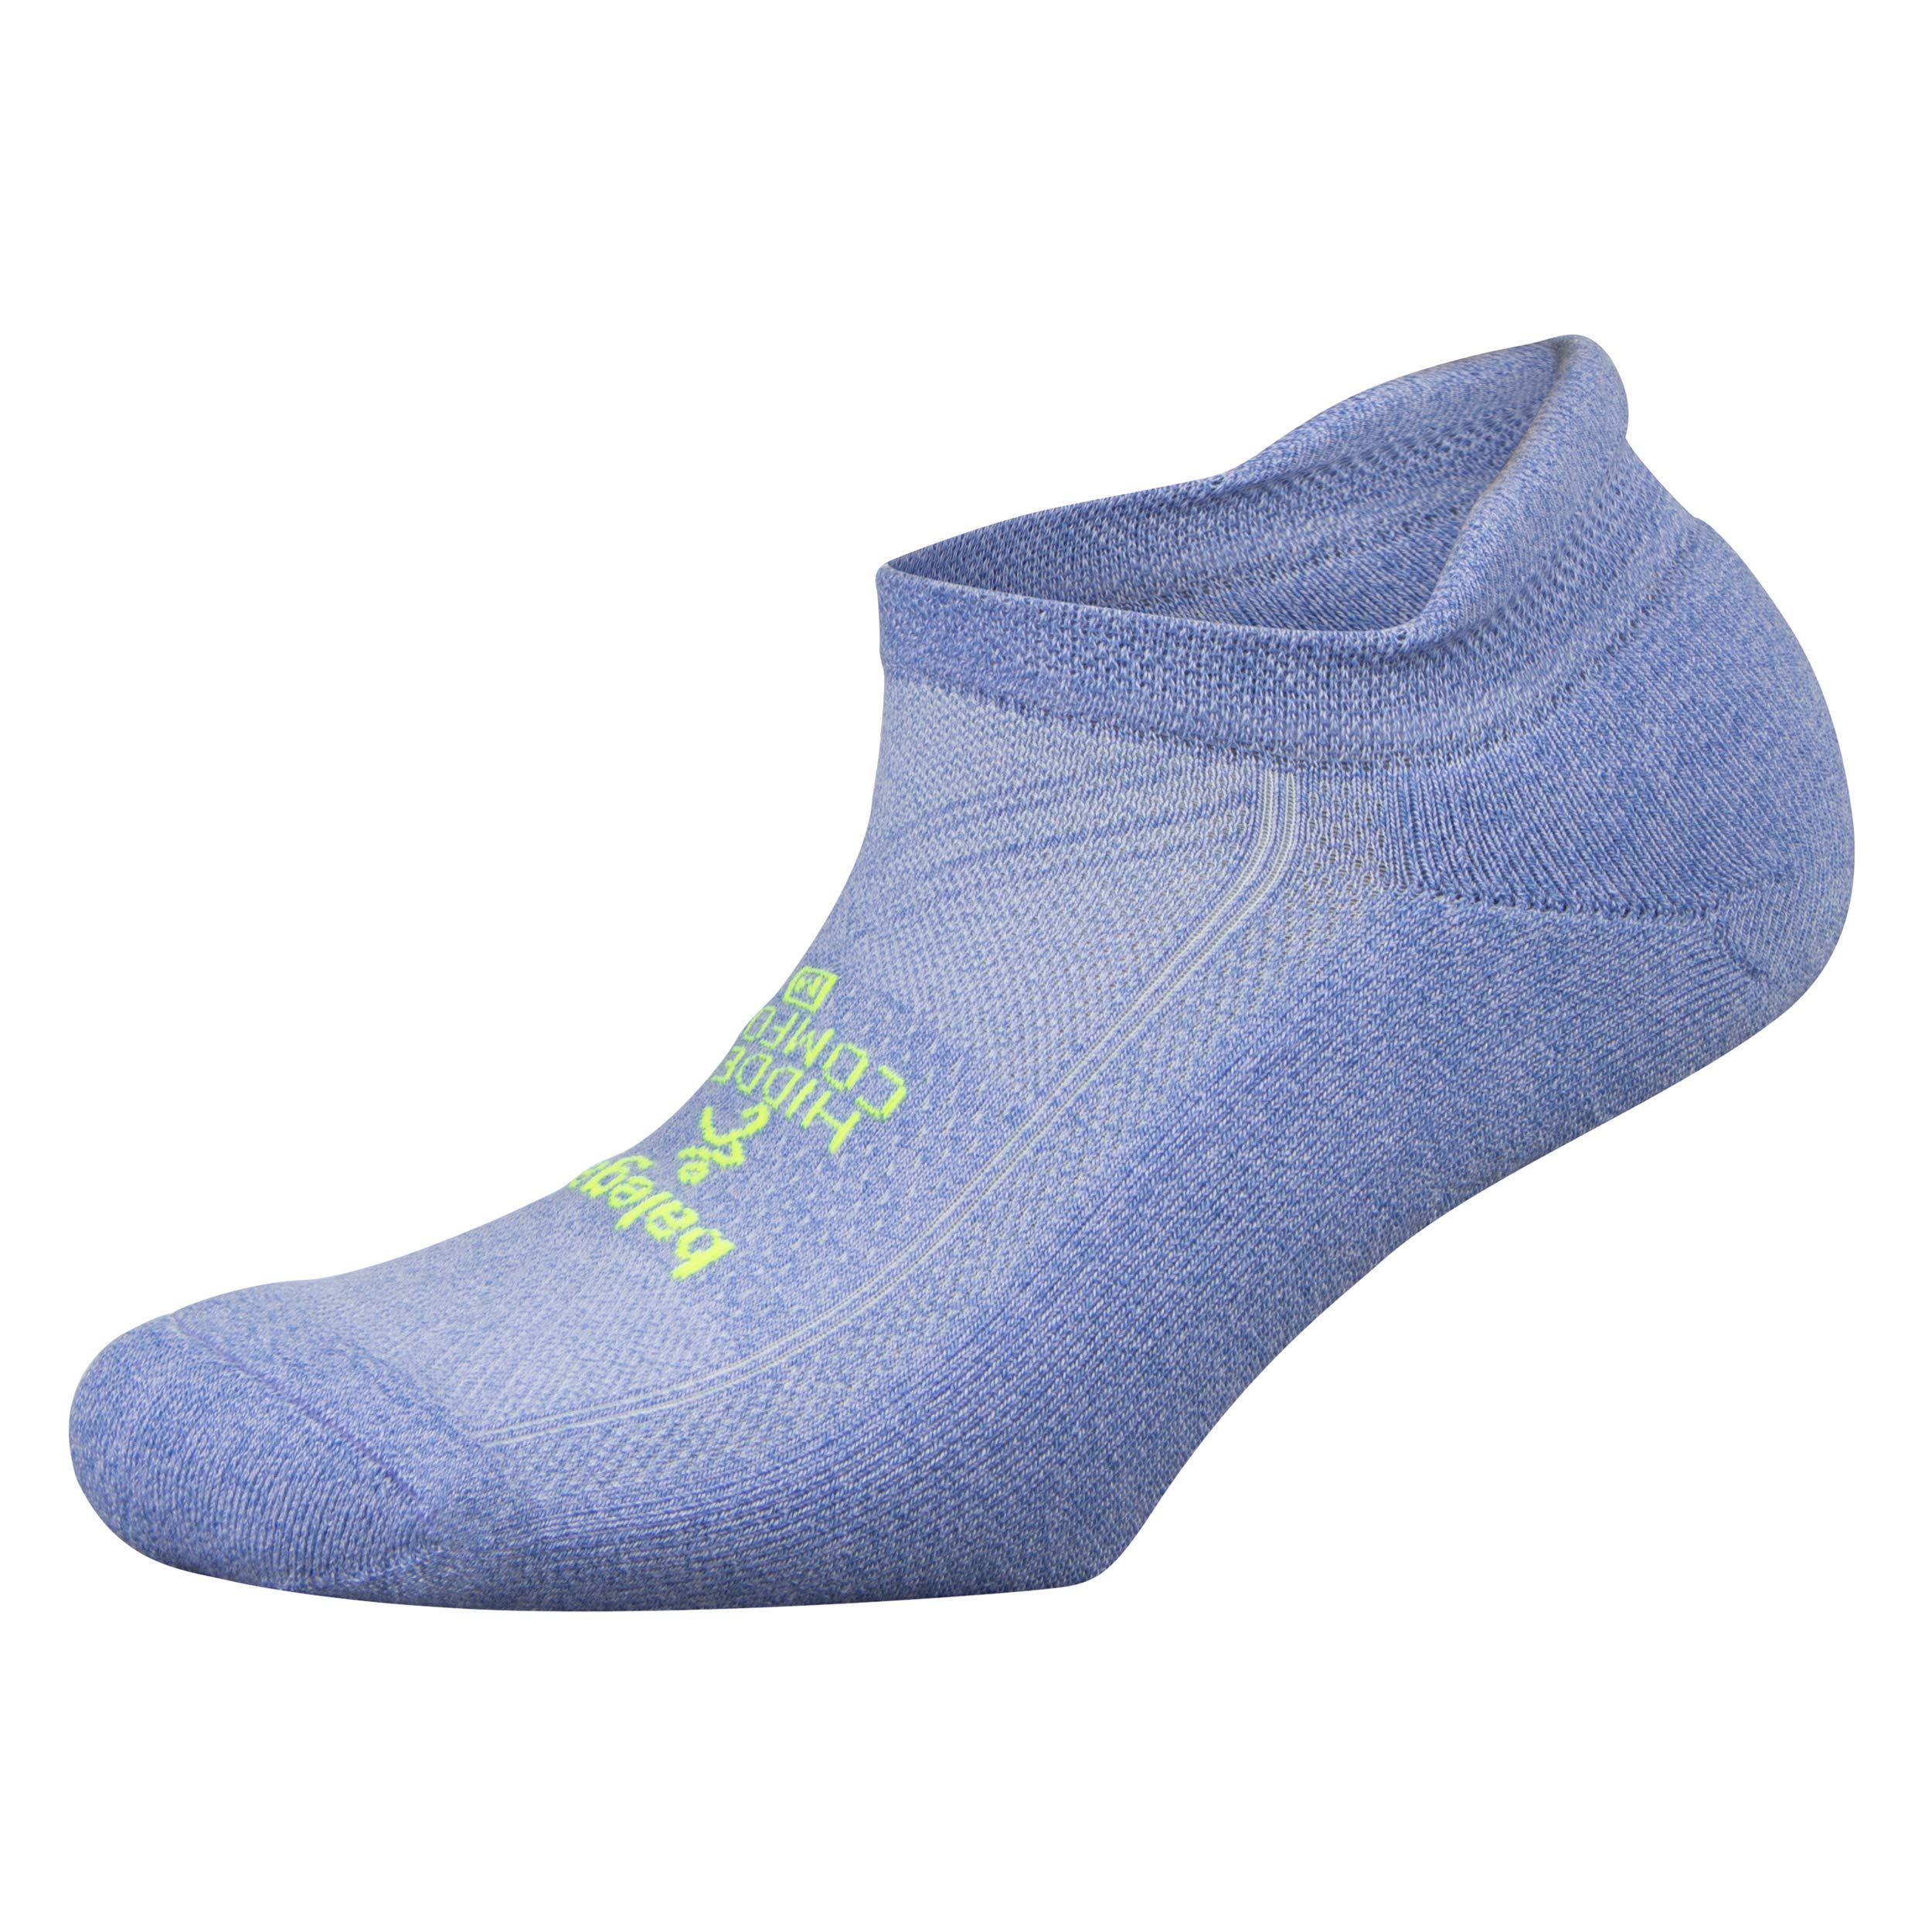 Balega Hidden Comfort No-Show Running Socks for Men and Women (1 Pair), Lilac, Small by Balega